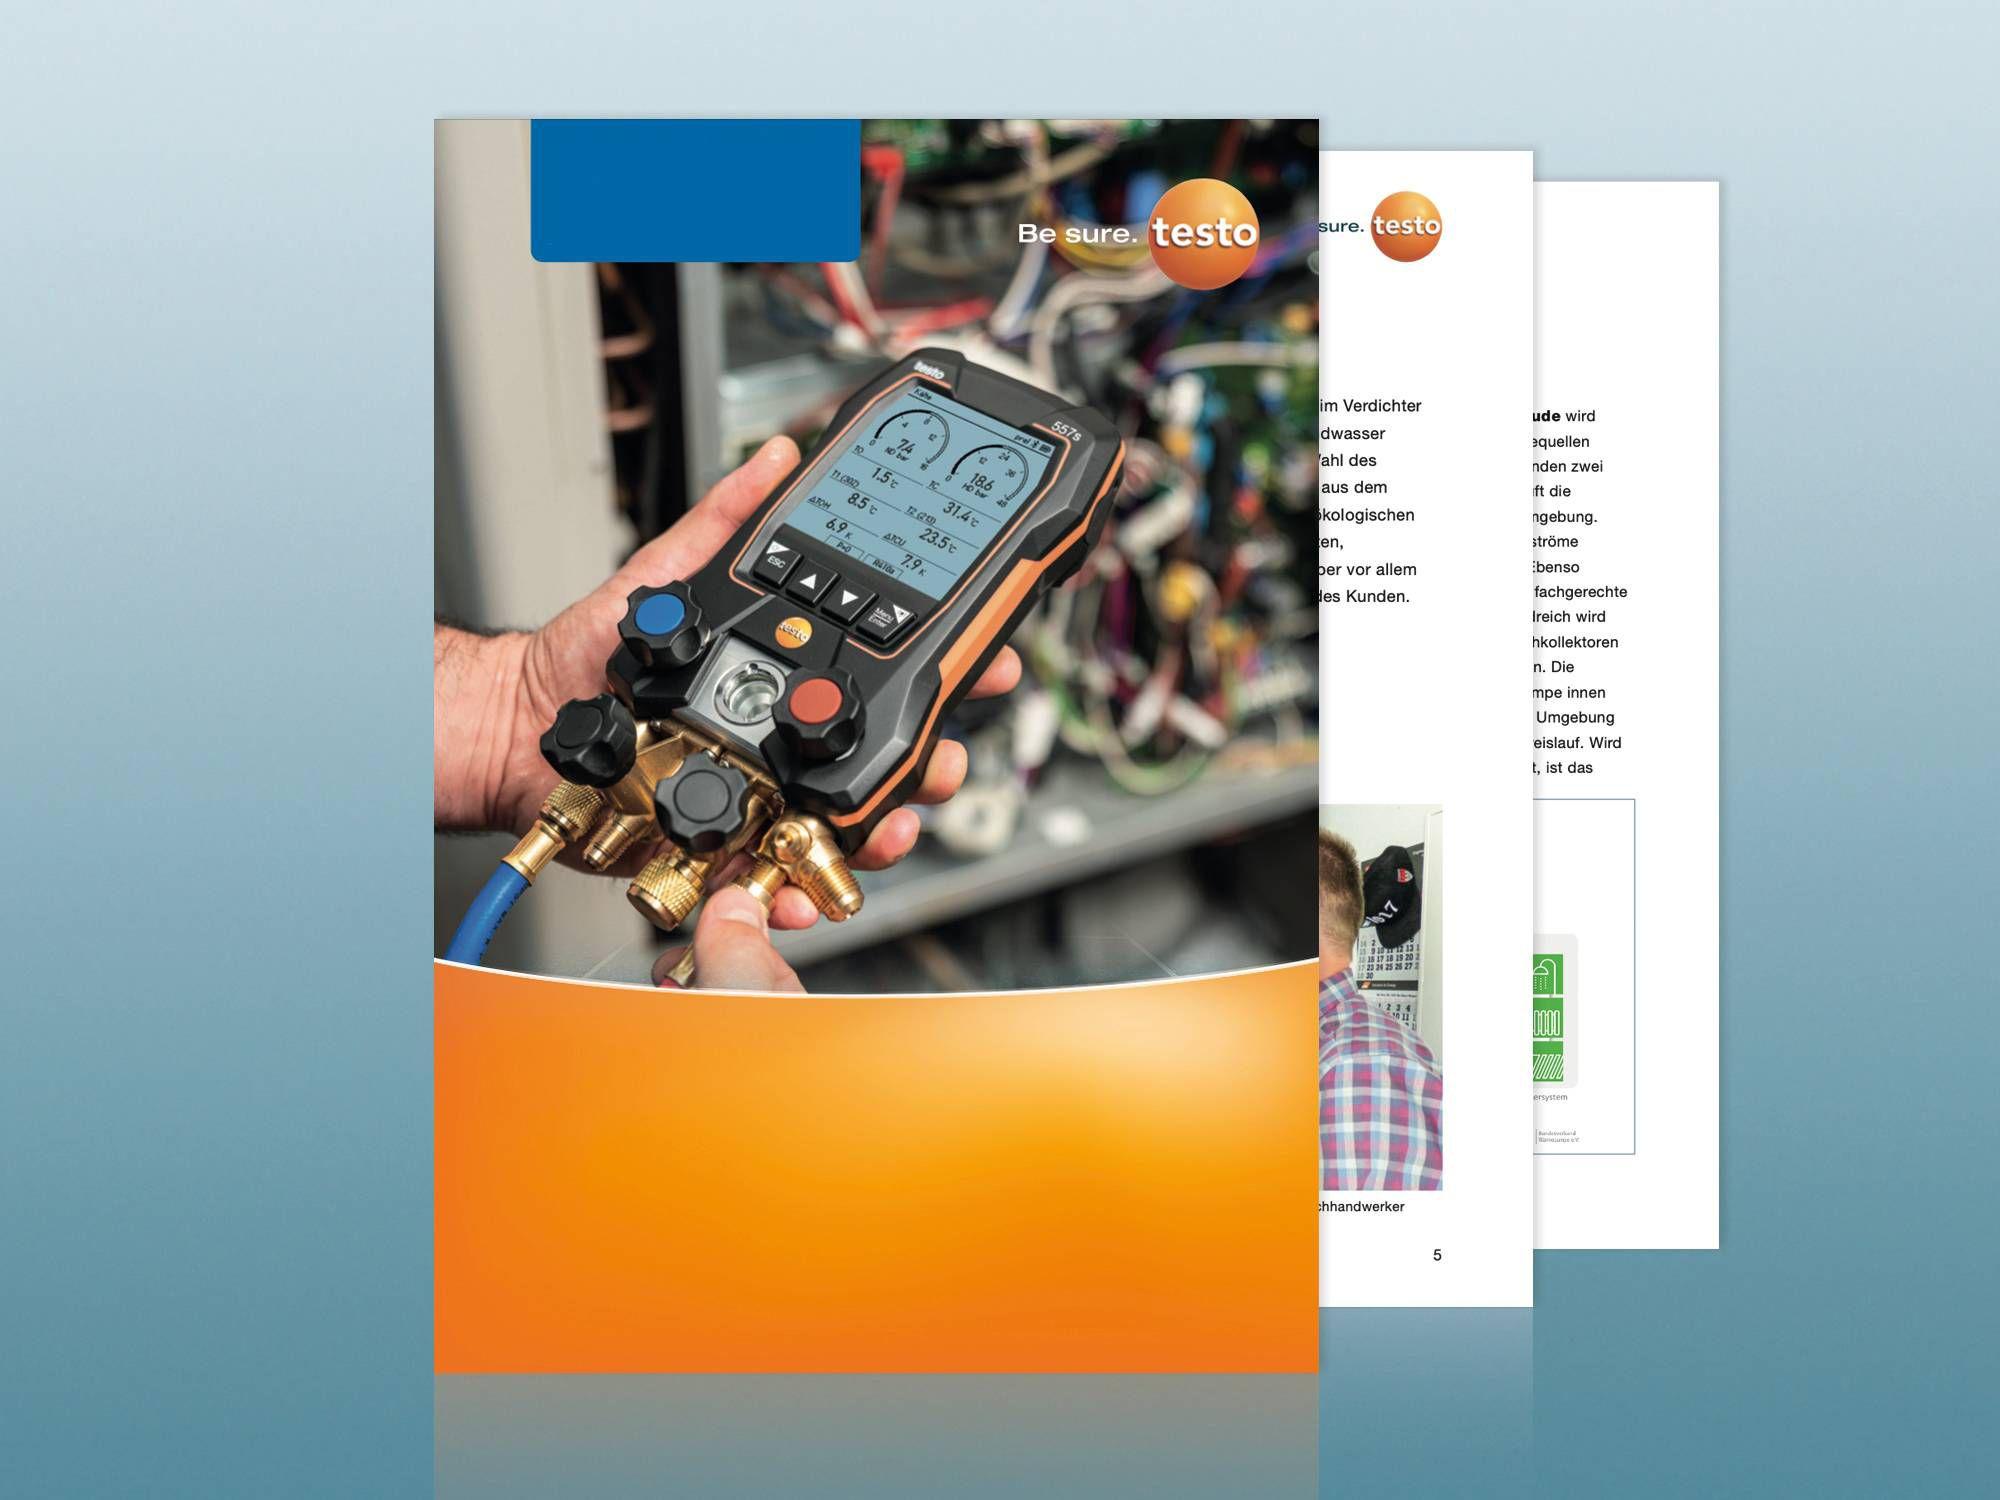 Heating-2021-Website-Banner-14-2000x1500.jpg